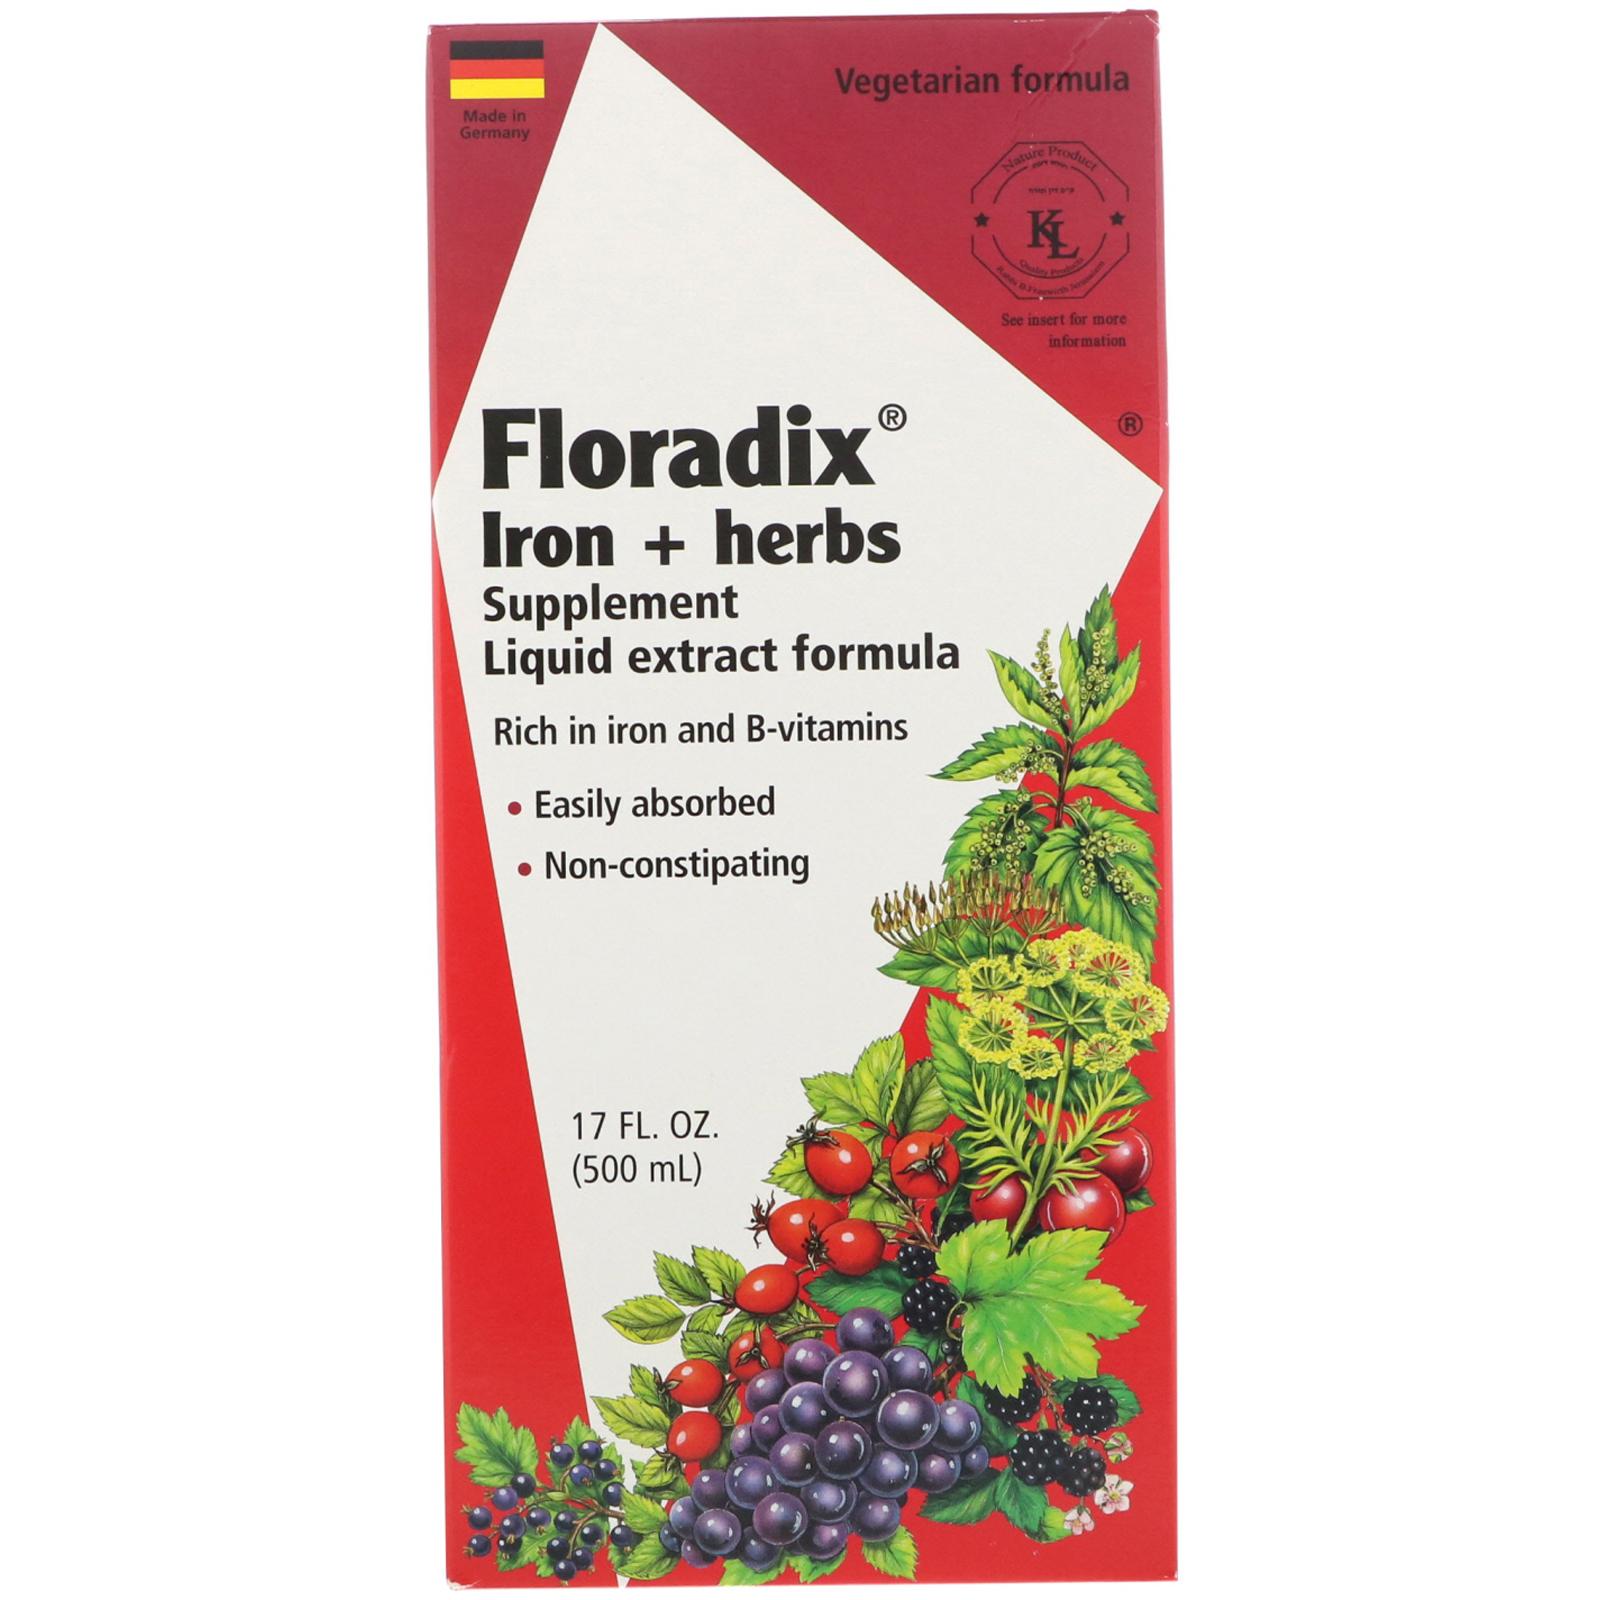 Flora Floradix Iron Herbs Supplement Liquid Extract Formula 17 Fl Oz 500 Ml Iherb